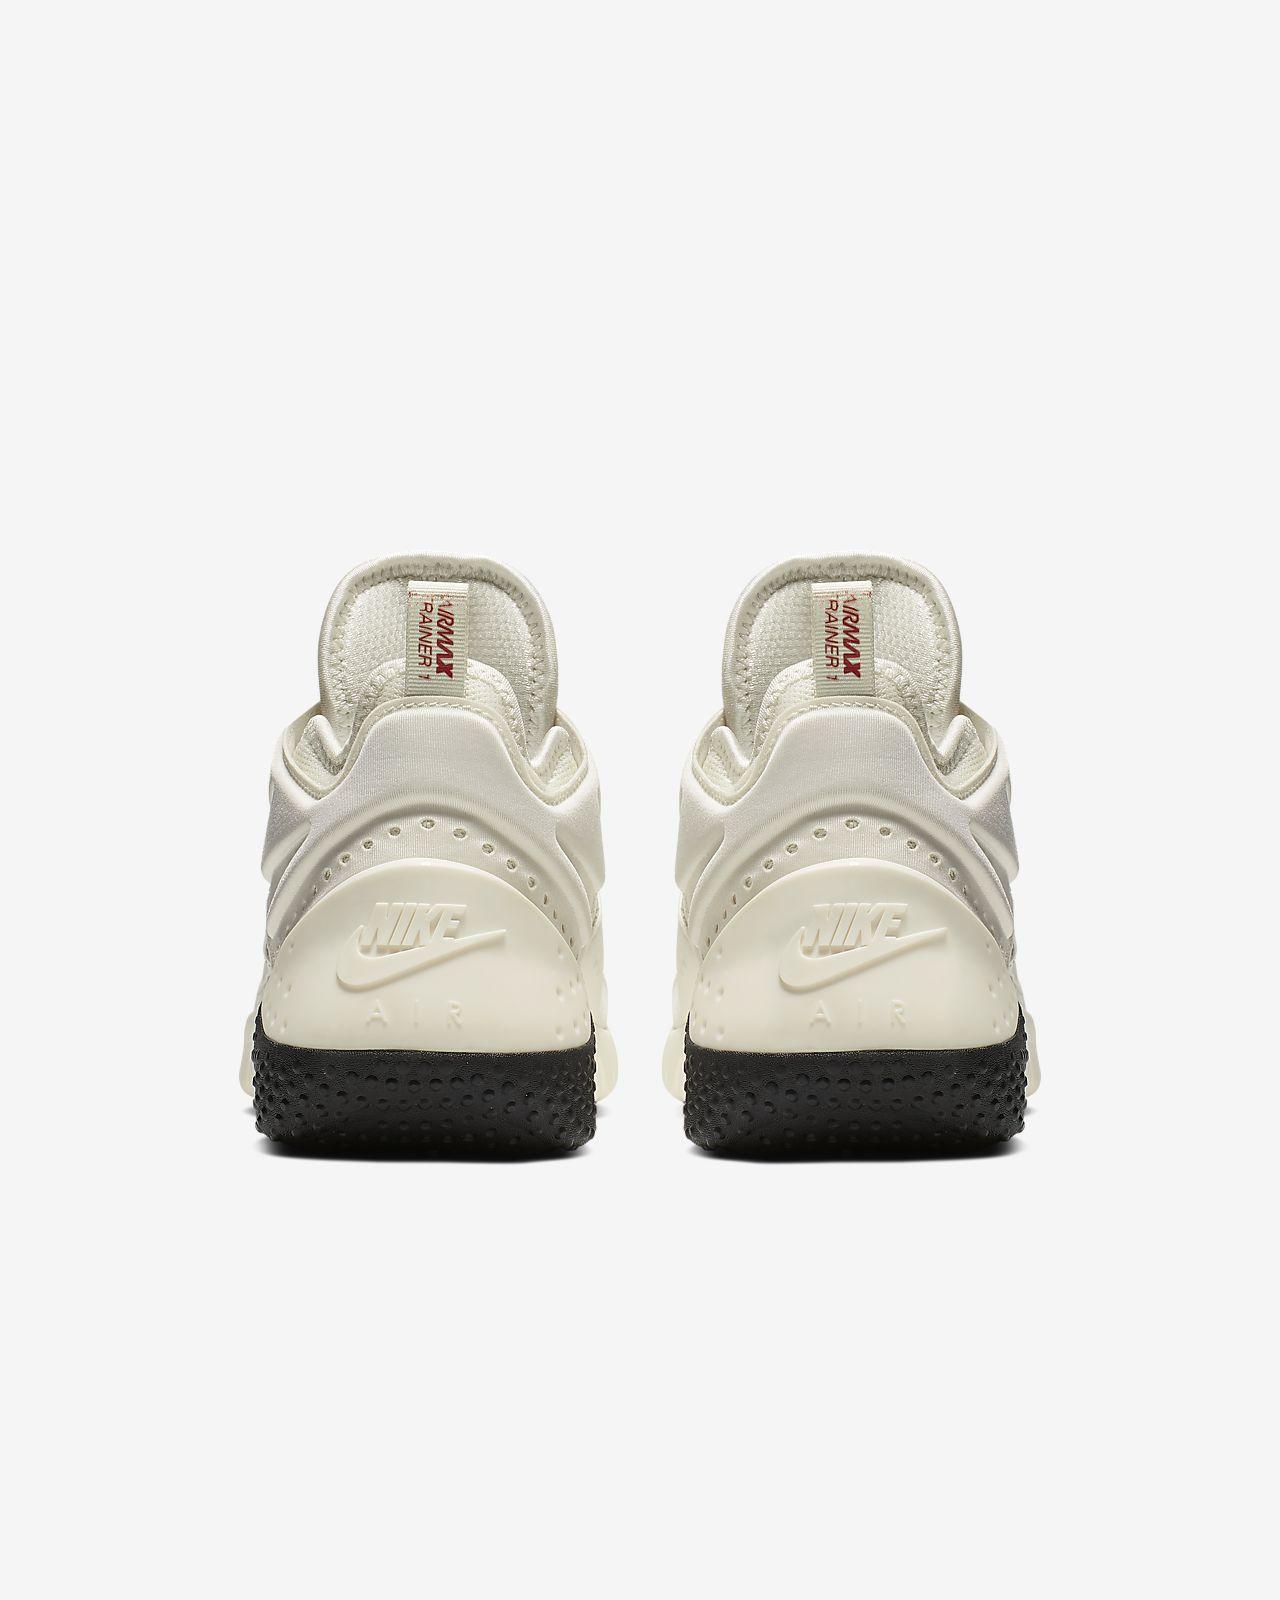 Nike Air Max Trainer 1 Men's GymTrainingWorkout Shoe